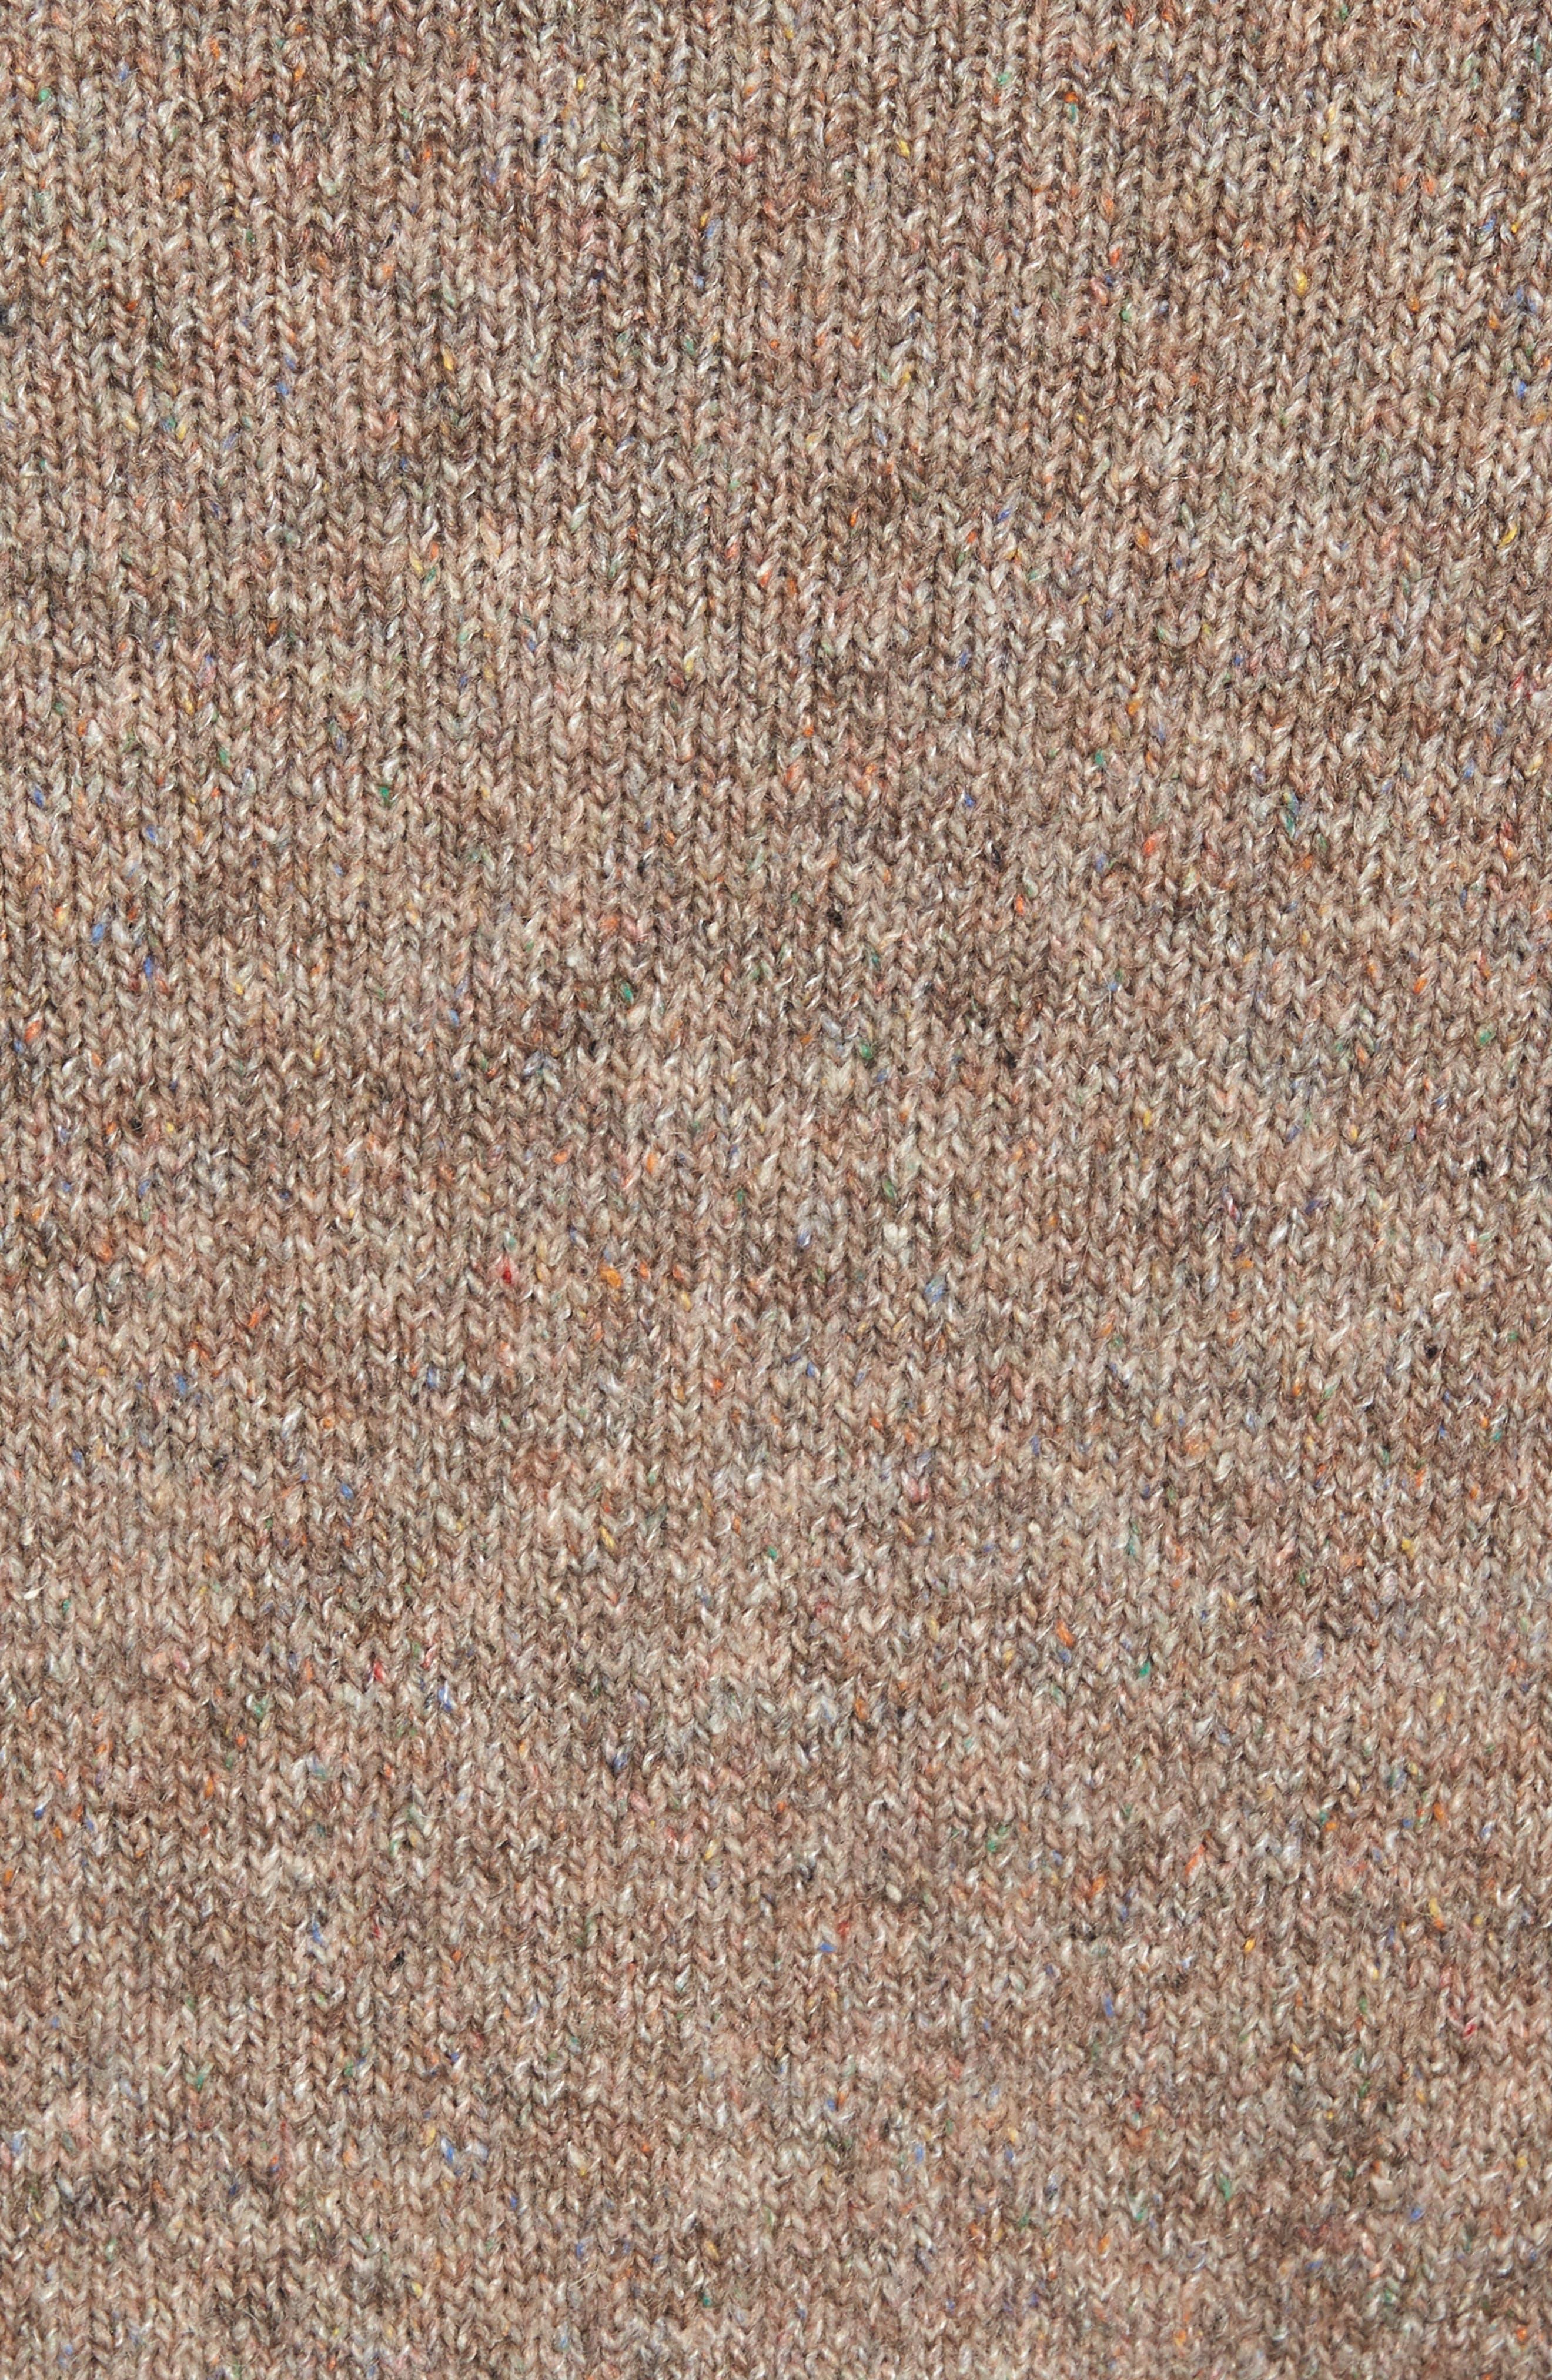 Tweed Crewneck Sweater,                             Alternate thumbnail 5, color,                             285